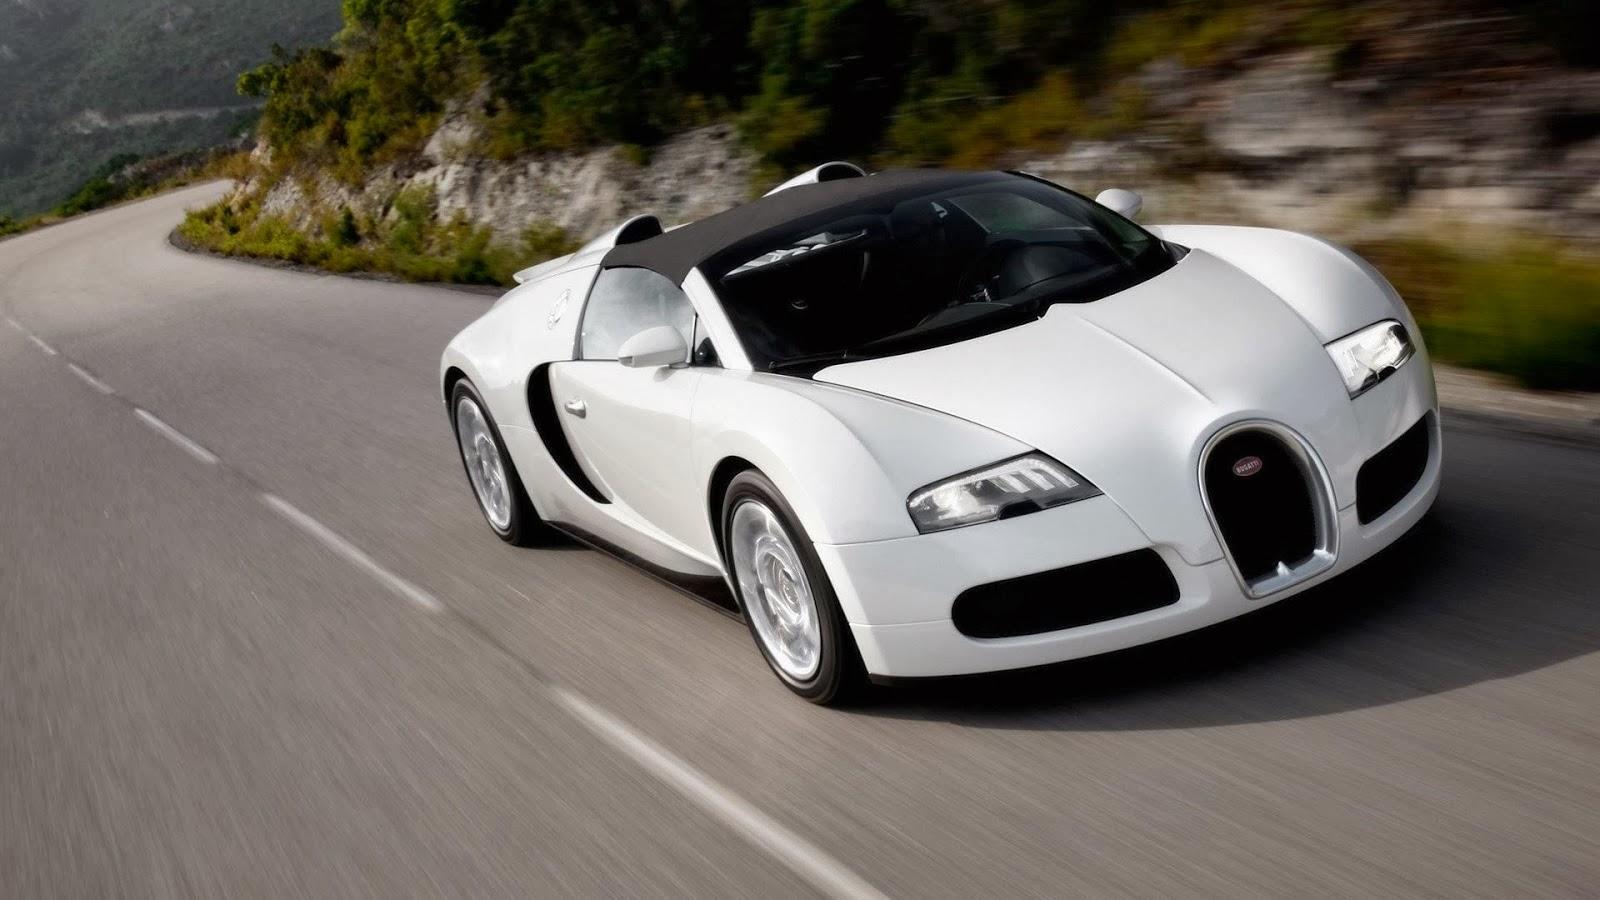 Bugatti Cars Wallpapers 1080p Bugatti Iphone Wallpaper Hd: All Hot Informations: Download Bugatti Veyron Sports Cars